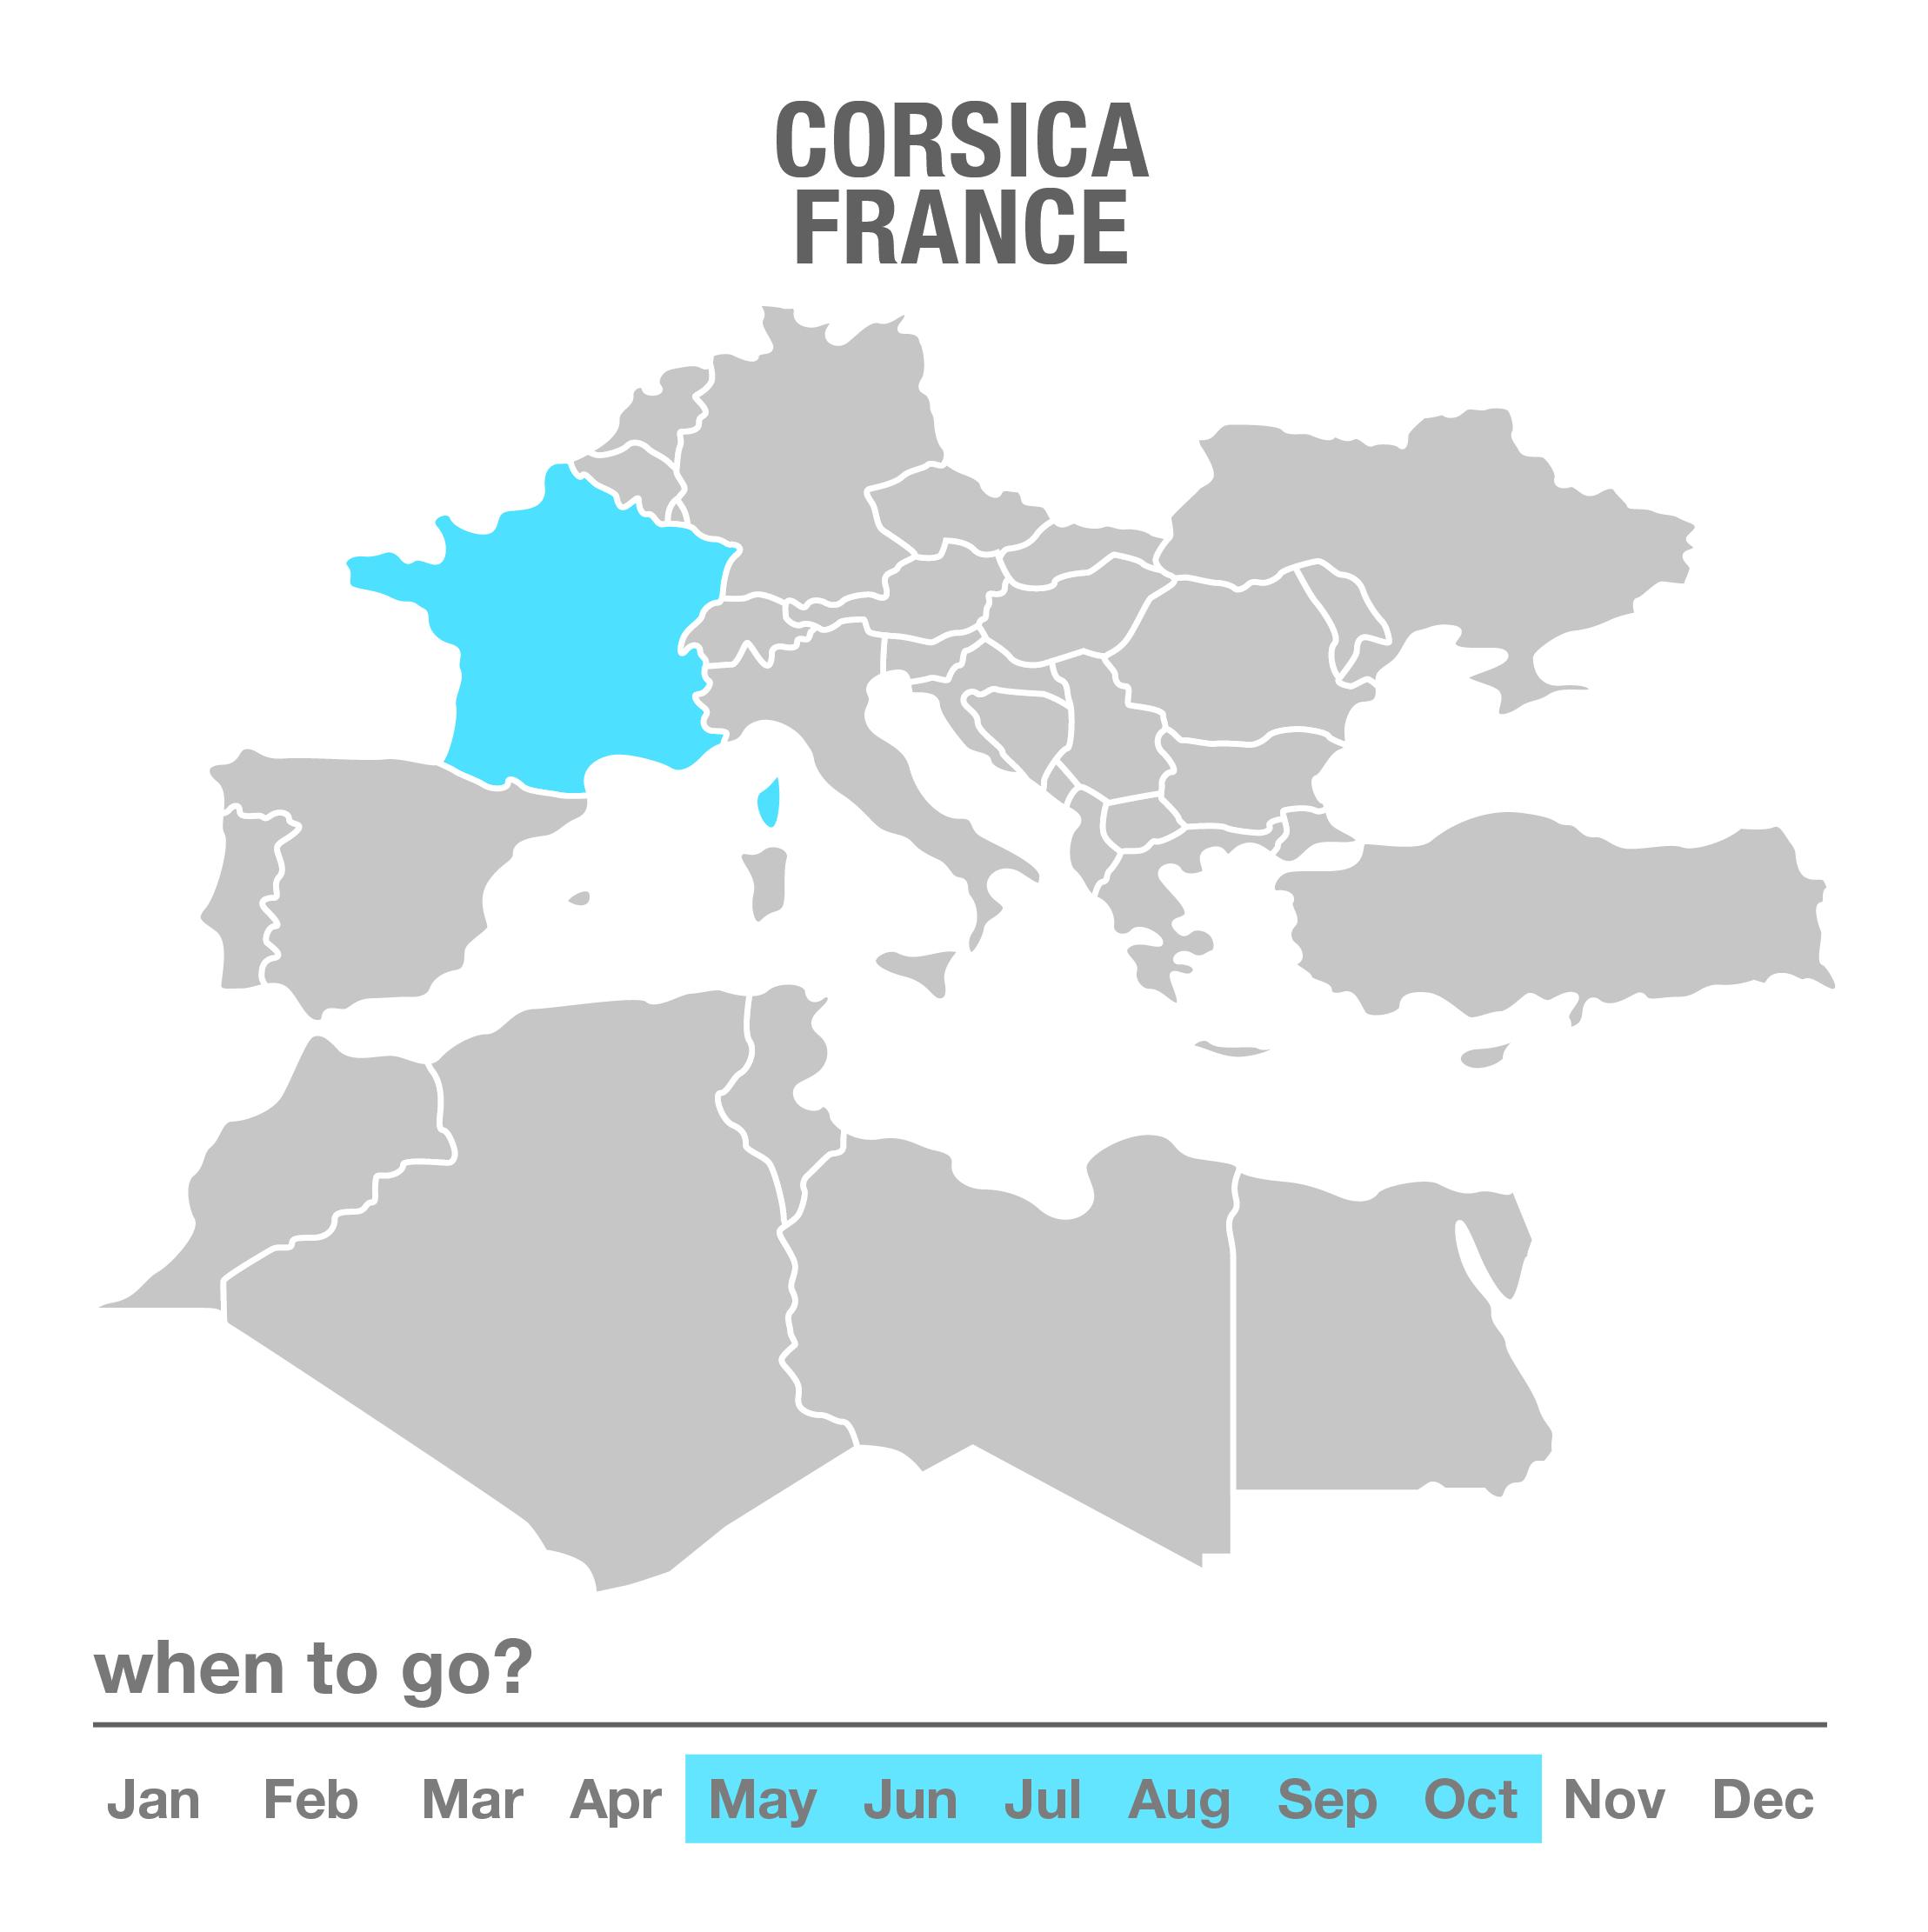 Luxury Tours Corsica, France